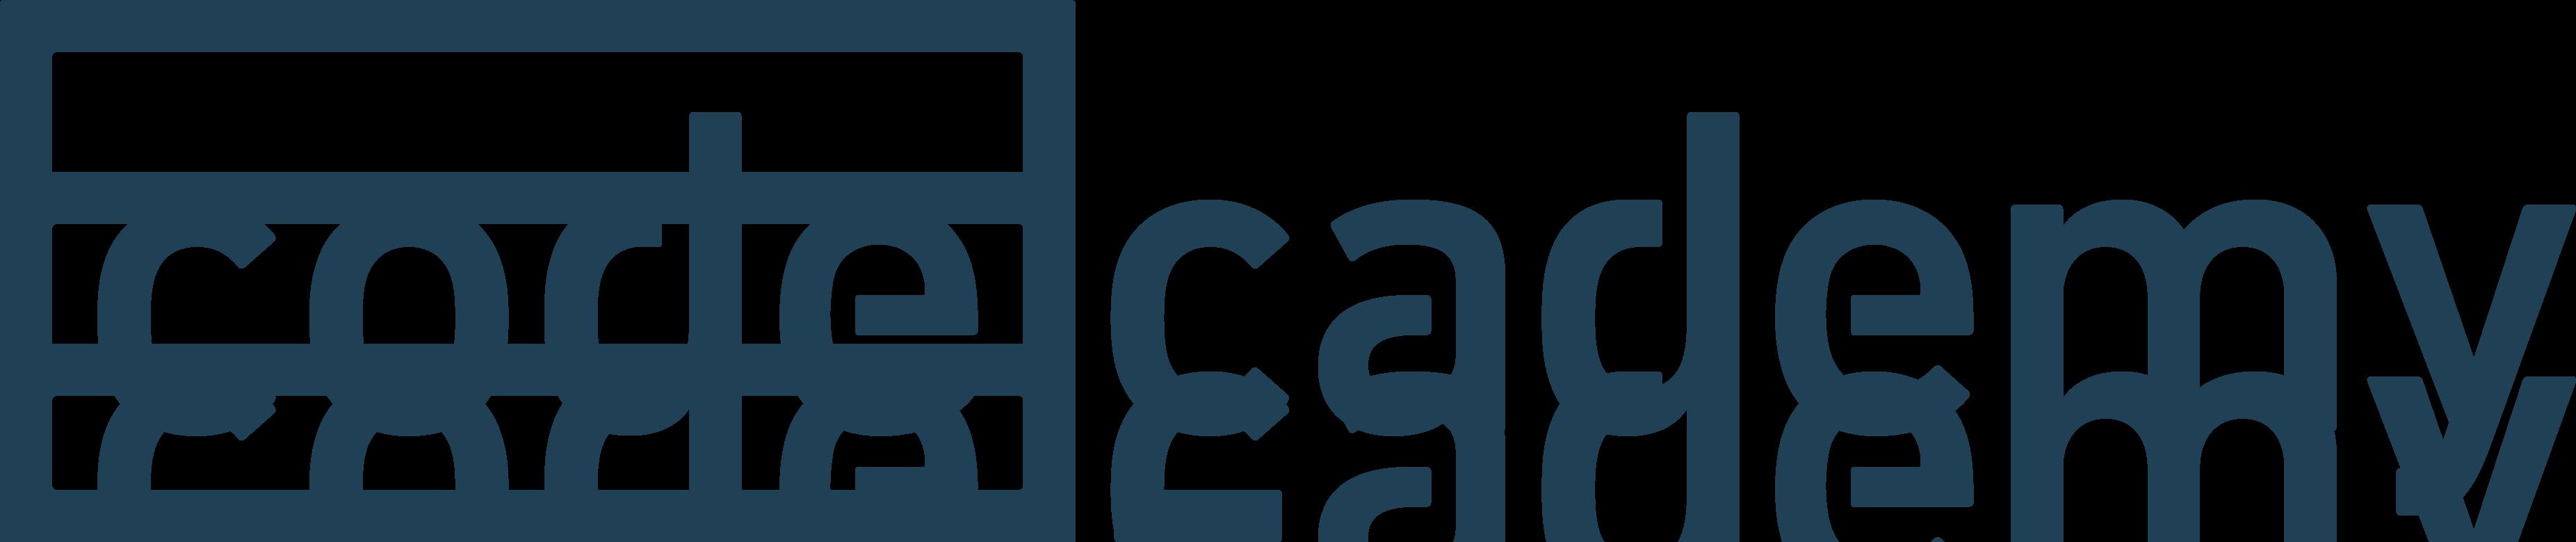 logo_blue_dark.png